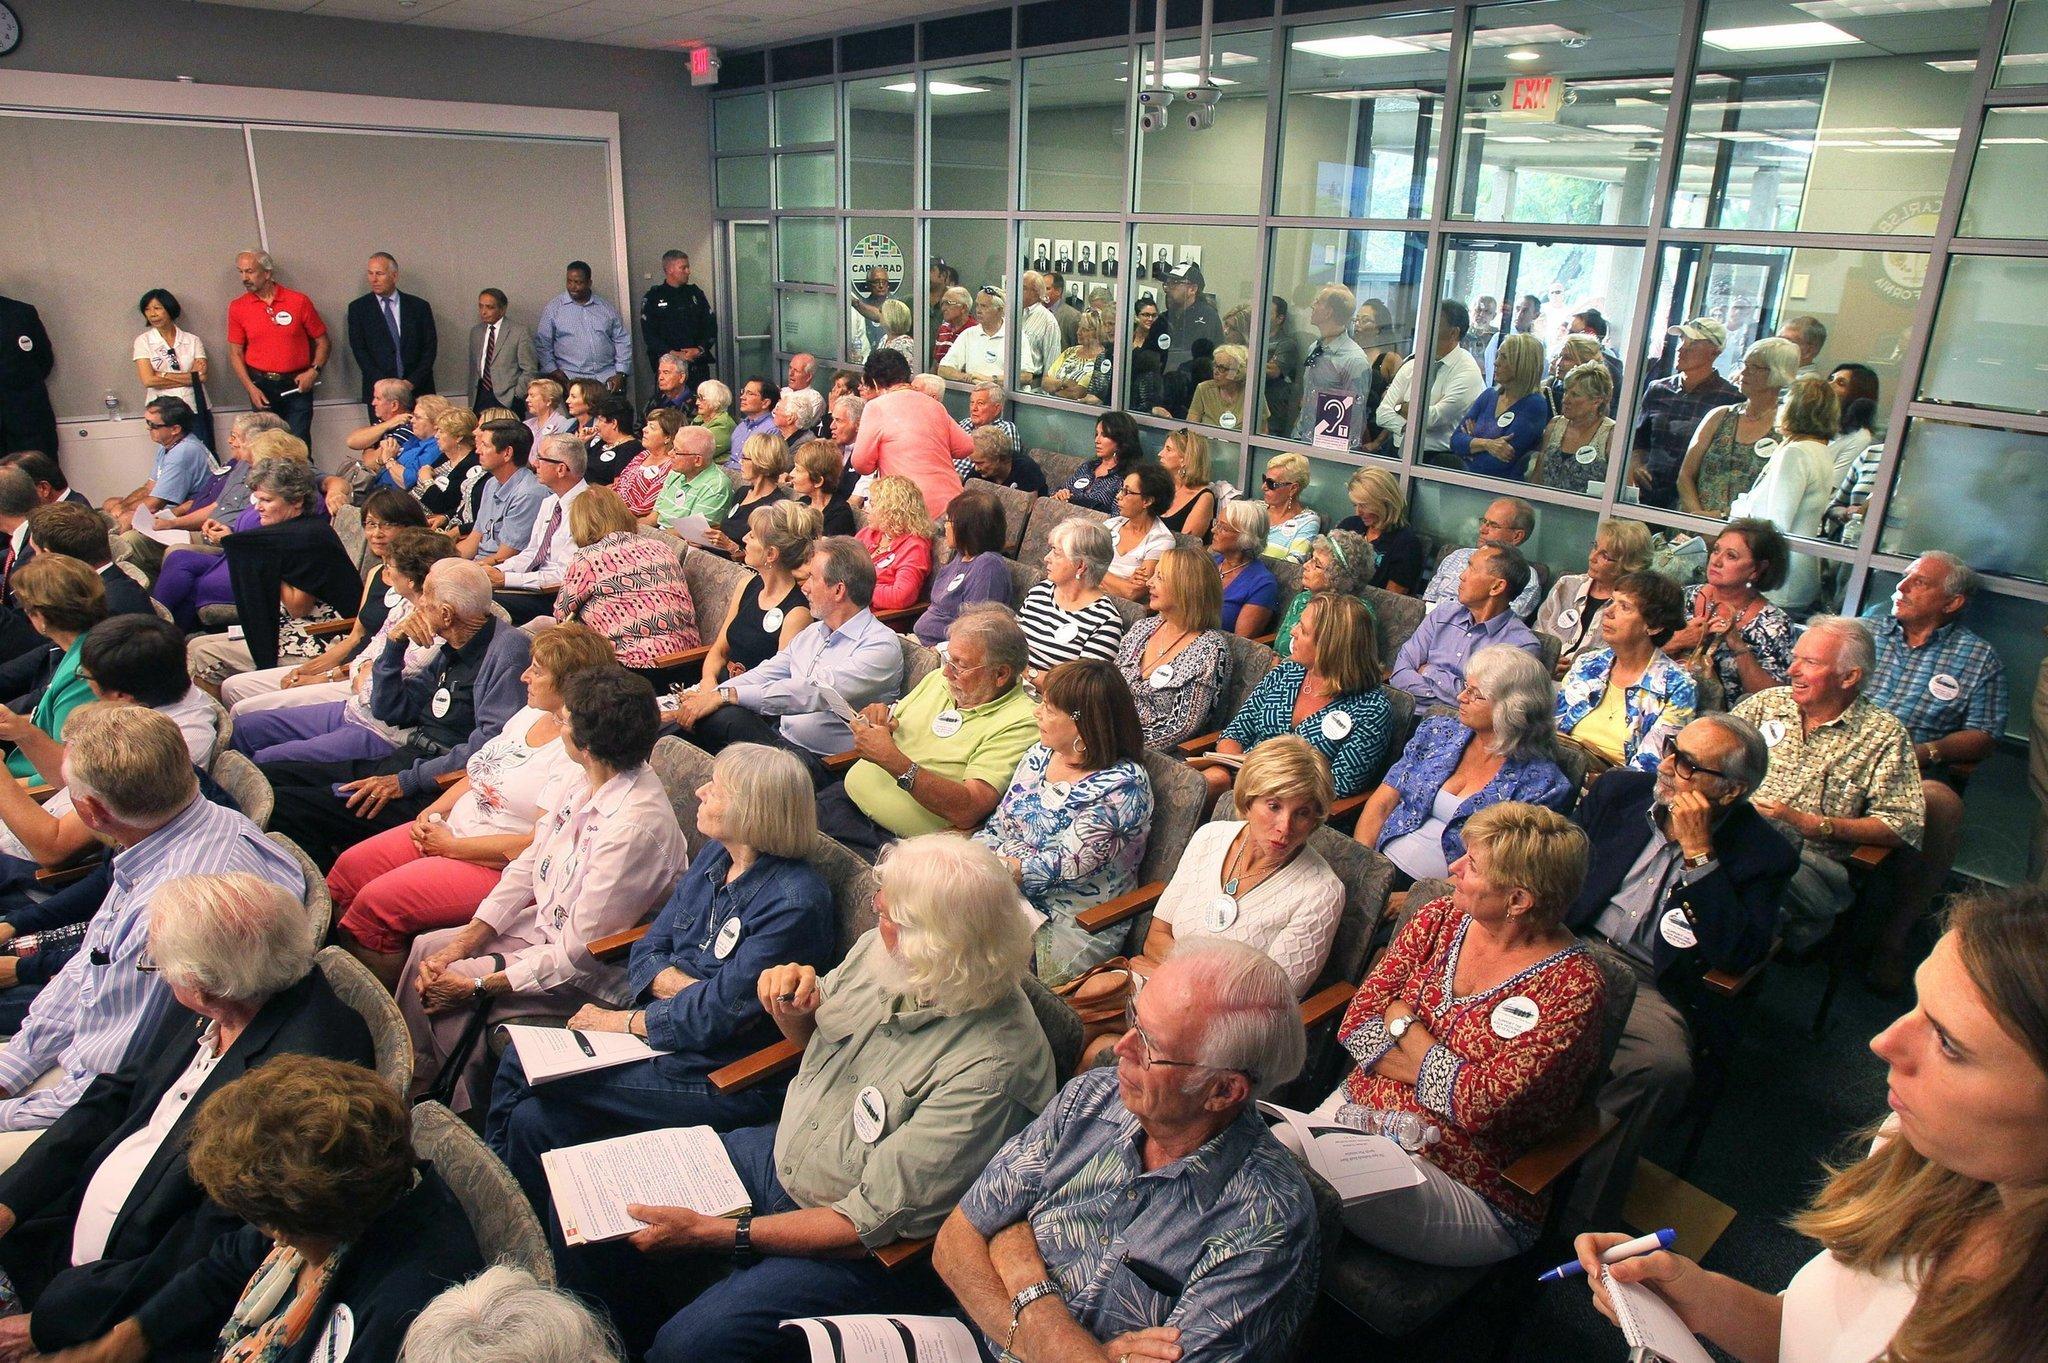 Carlsbad Council Considers Development The San Diego